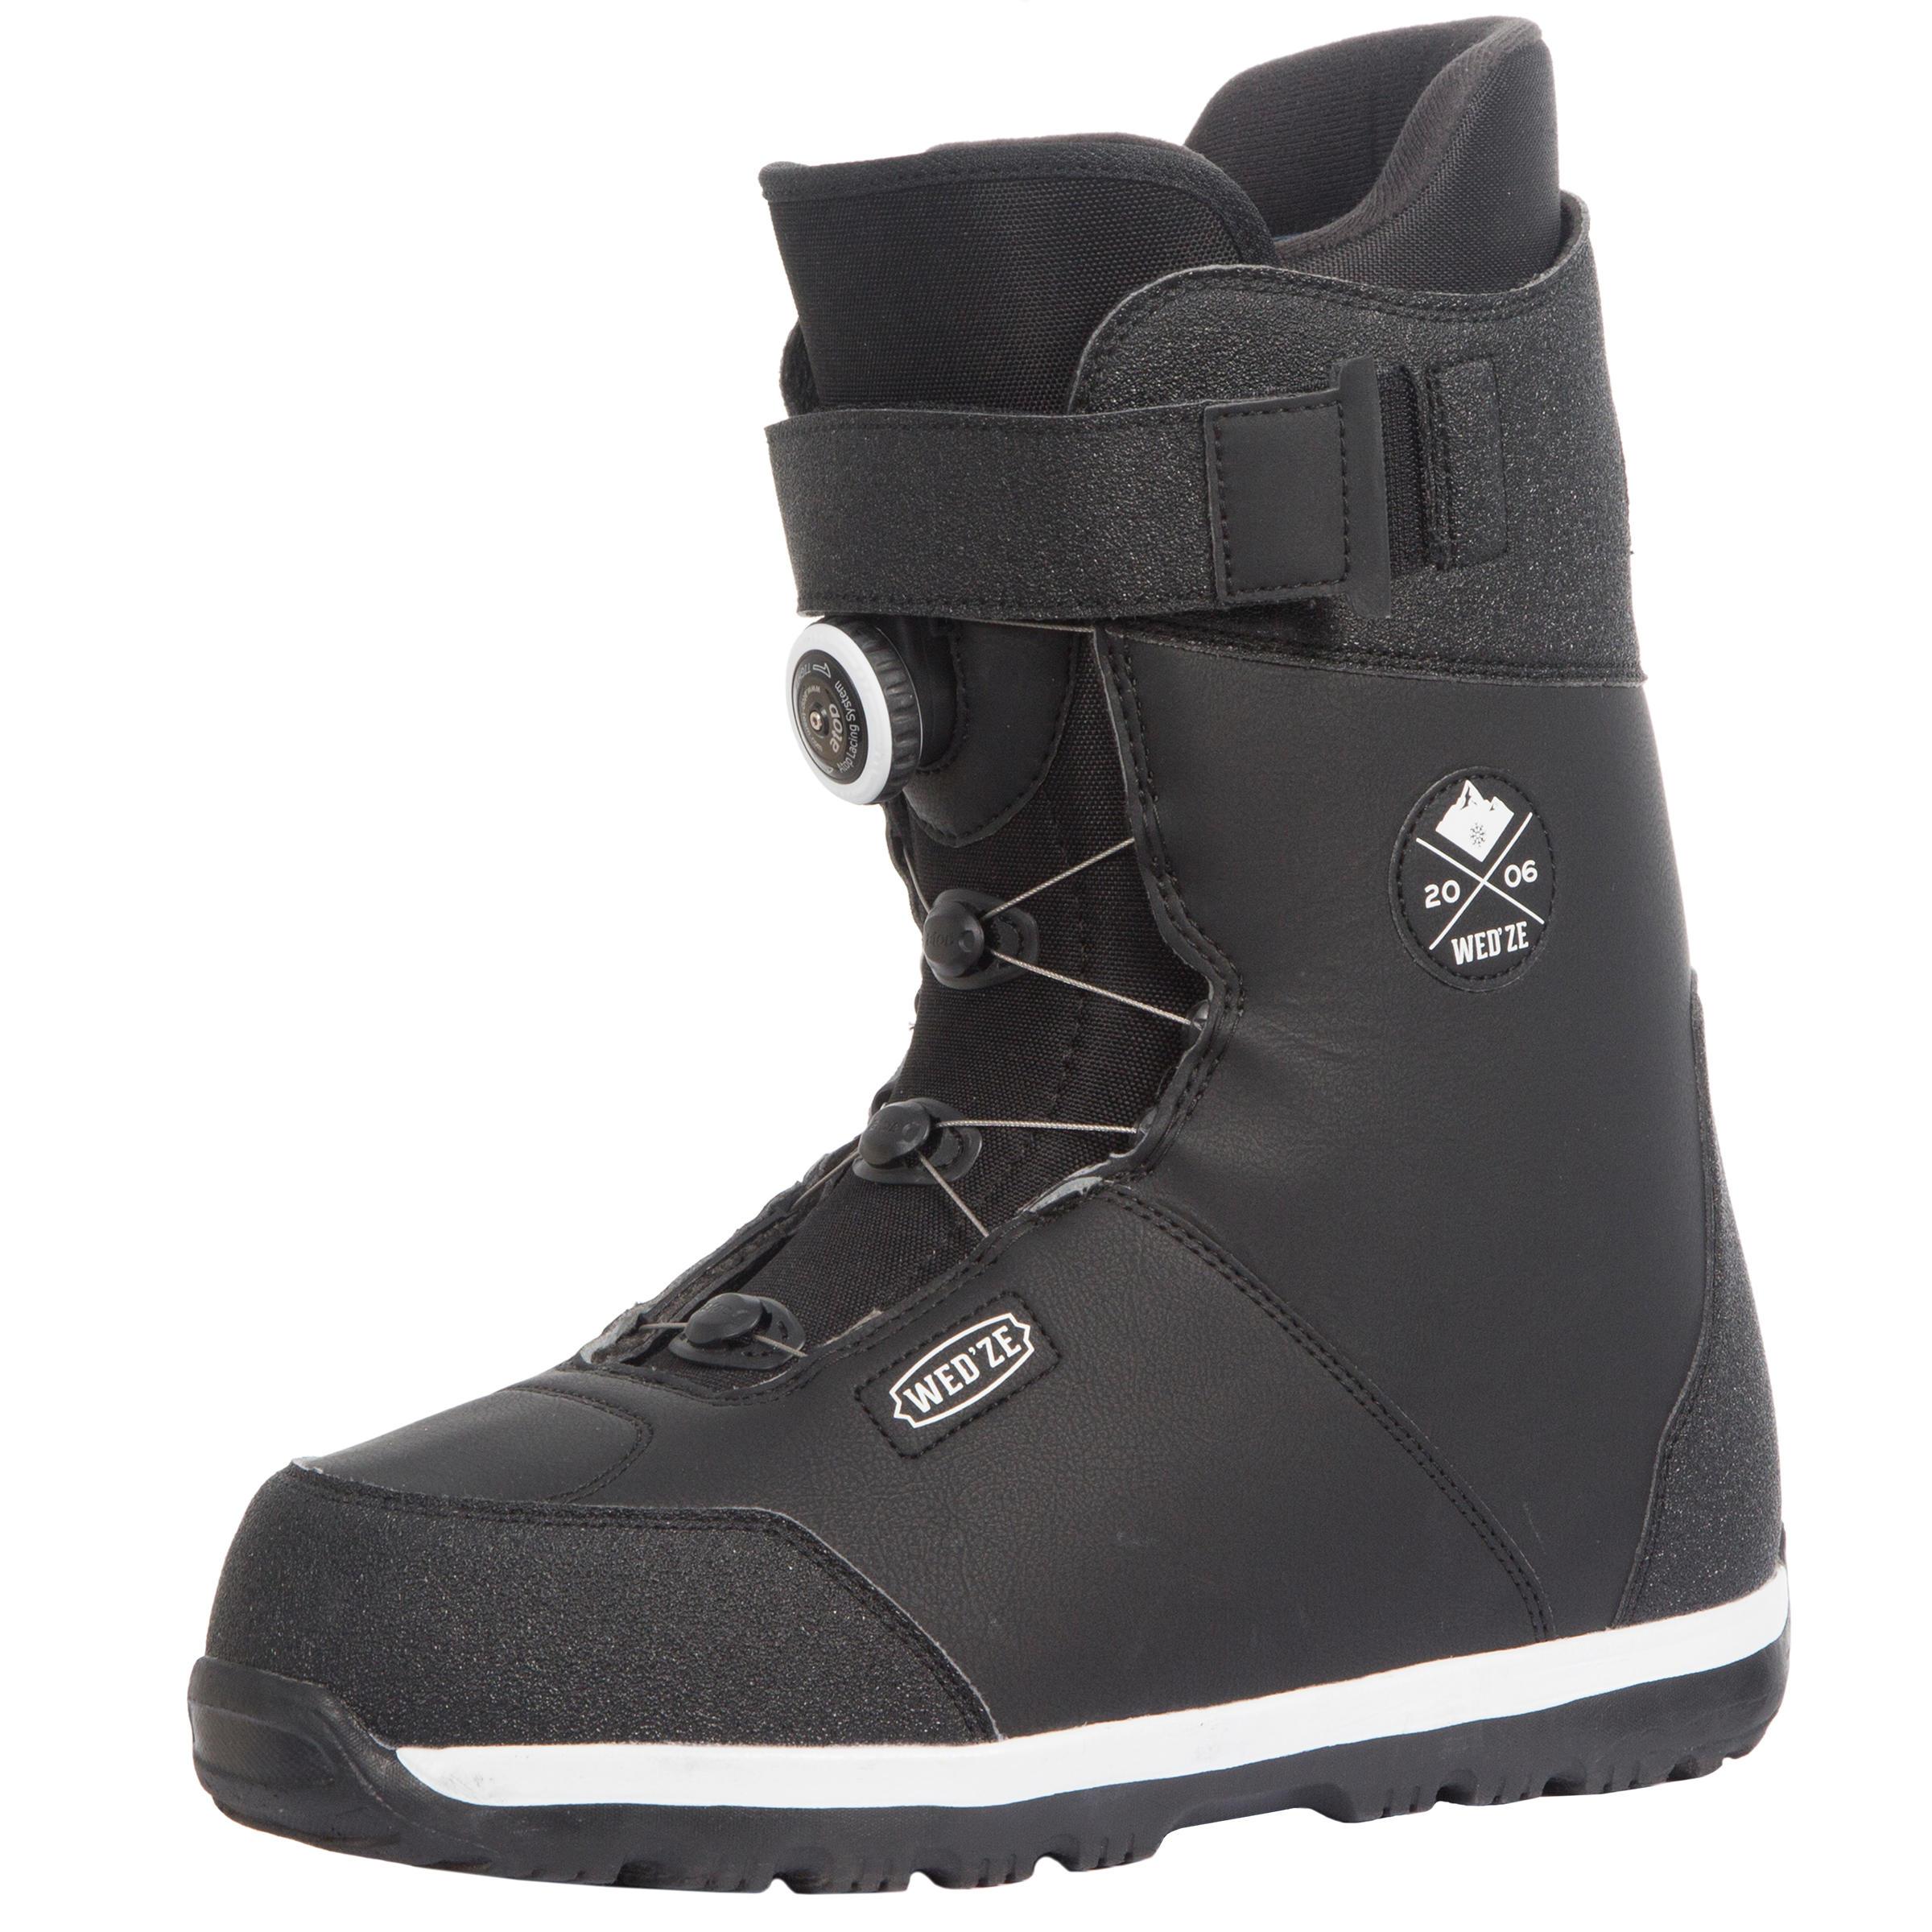 Herren Snowboardschuhe Foraker 500 Cable Lock 2Z All Mountain Herren schwarz | 03608449879620